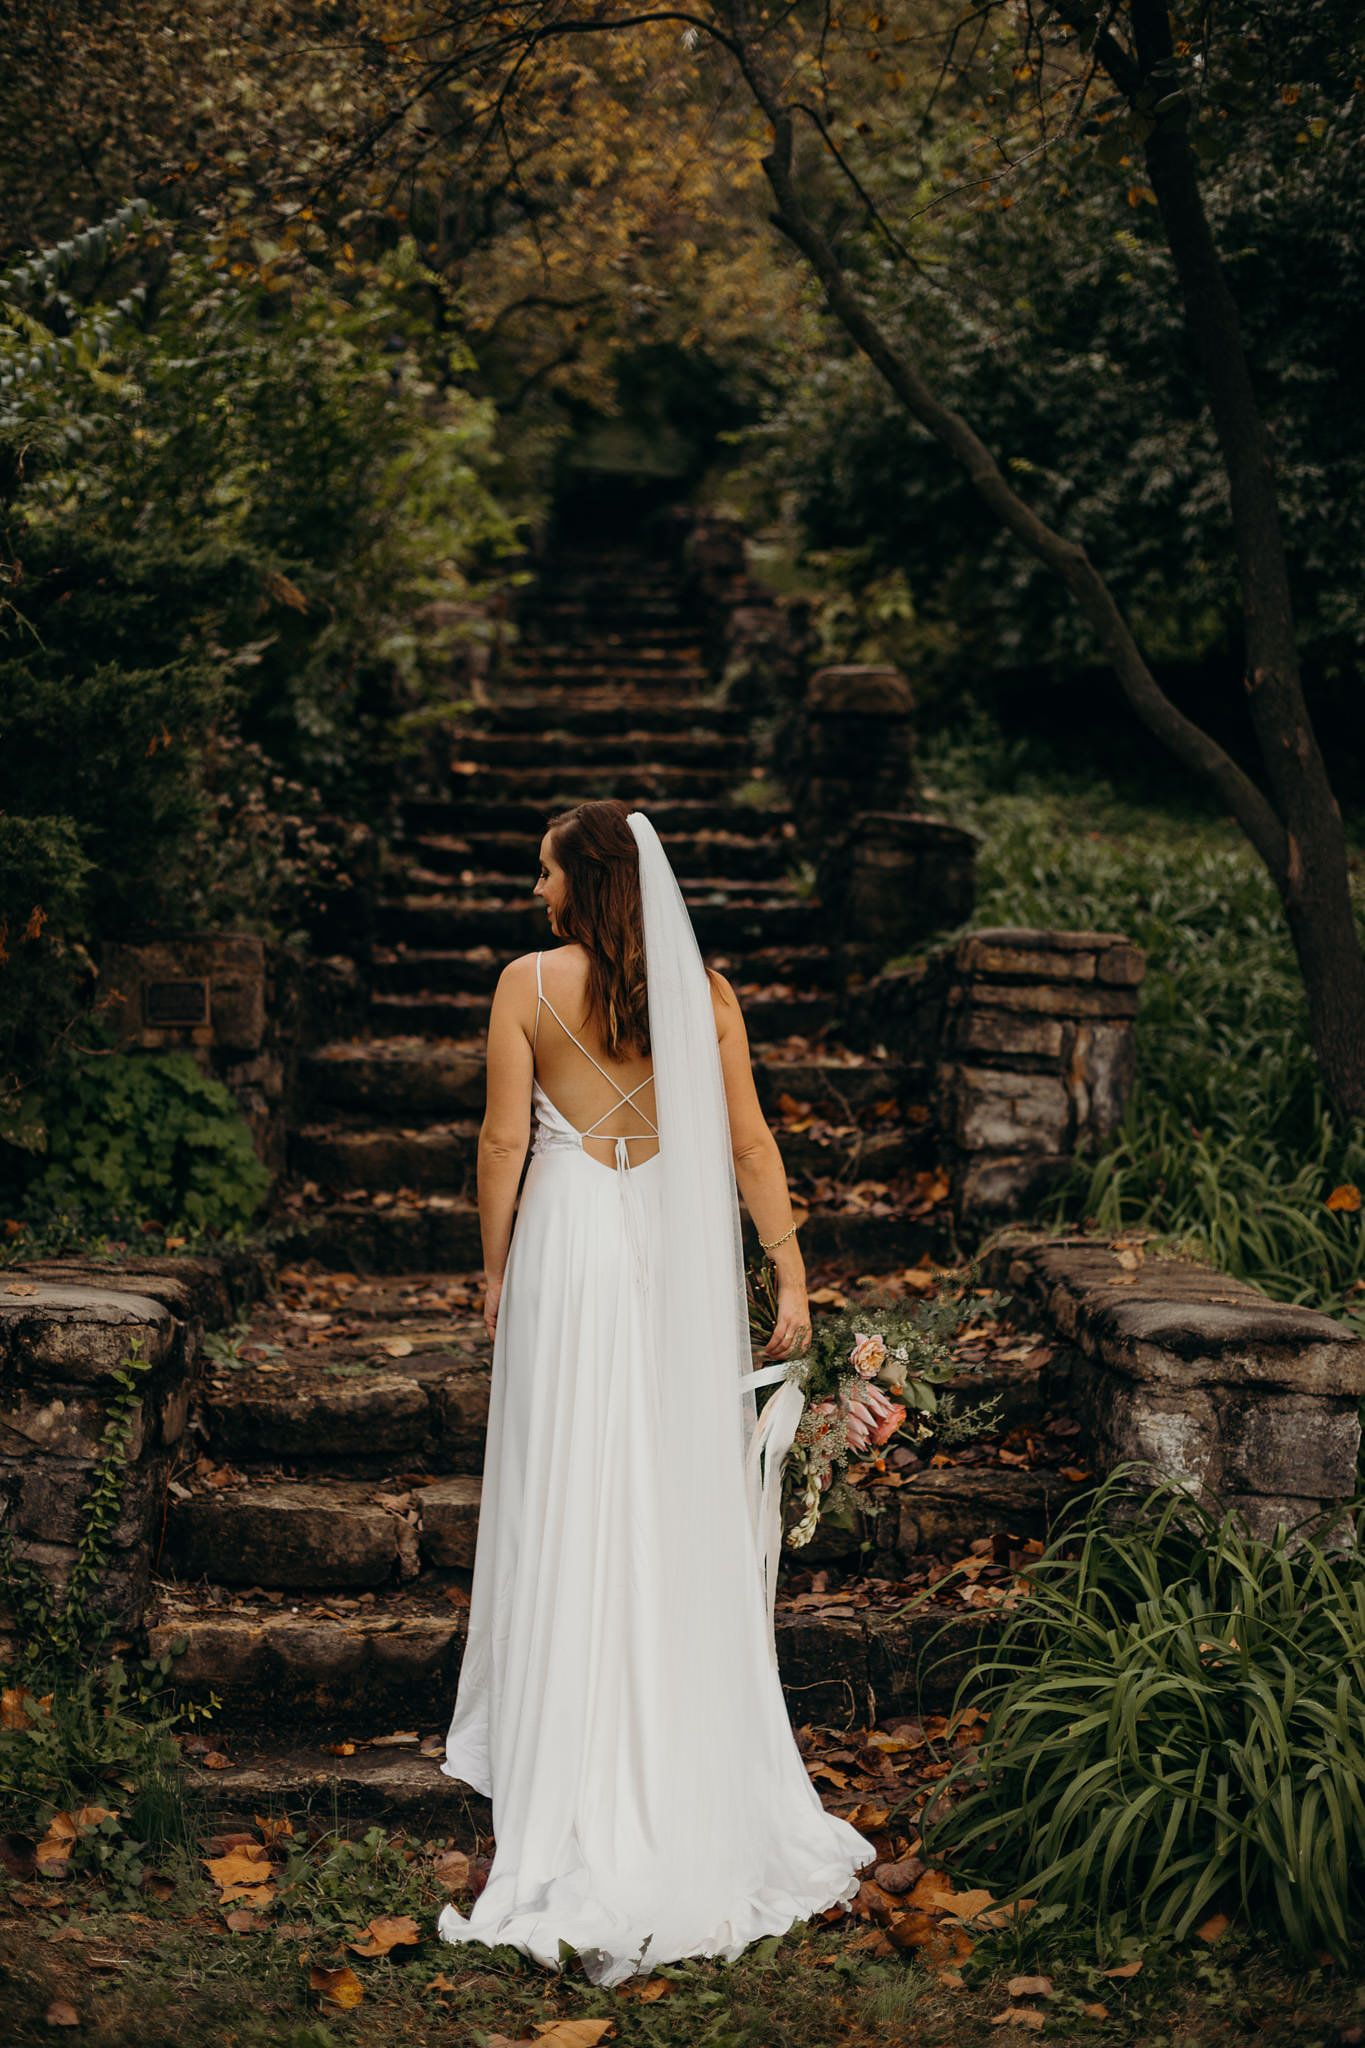 Bridal Fashion Wedding Dress Rustic Lake Wedding Sparkle Gown Rustic Wedding Dresses Wedding Dresses Simple [ 2048 x 1365 Pixel ]